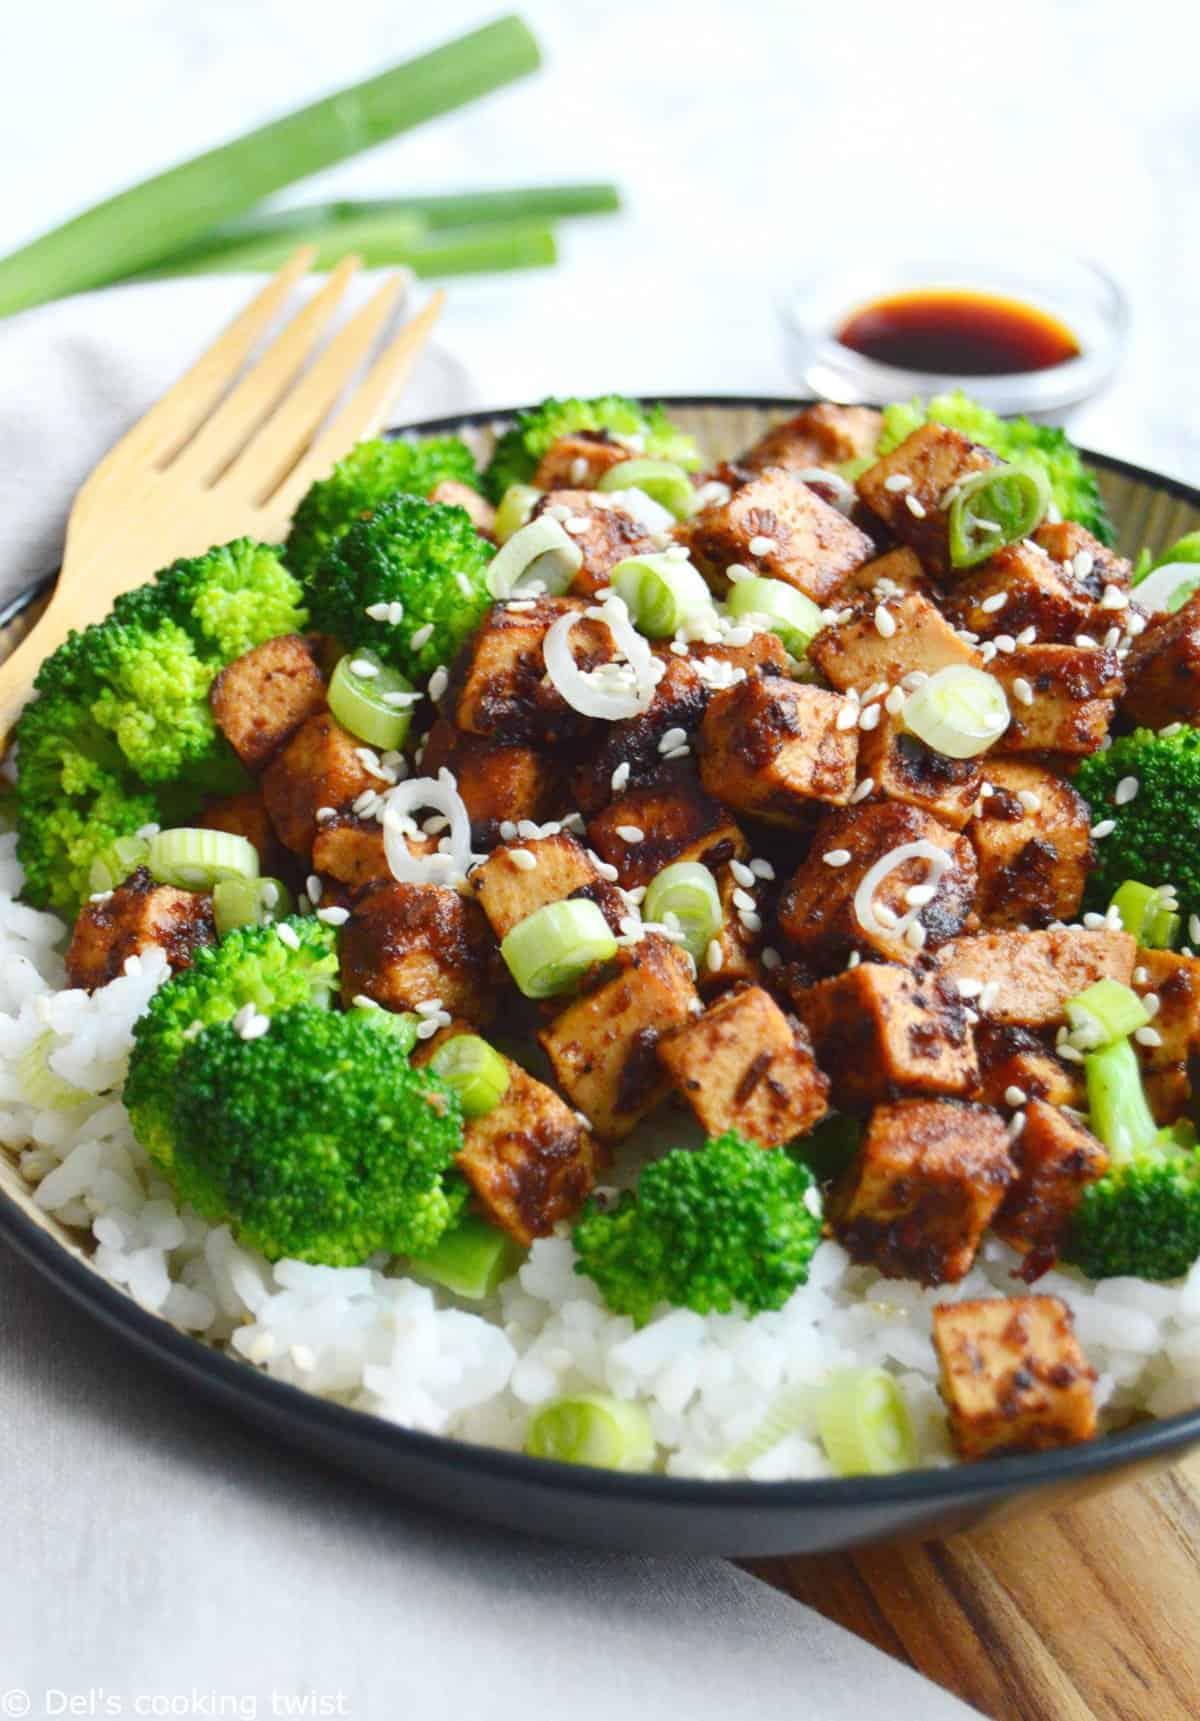 Asian Tofu Broccoli Stir Fry